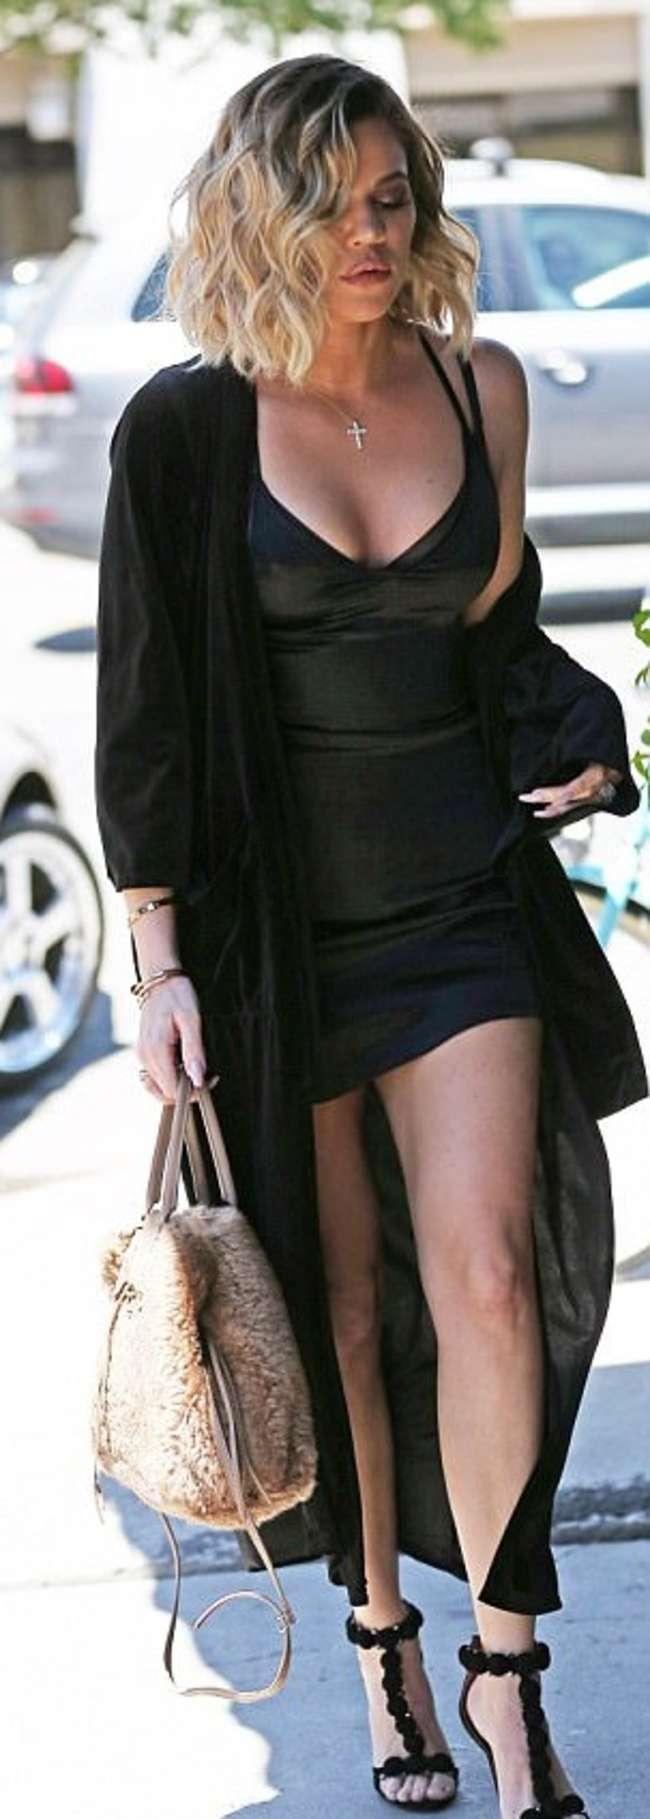 Khloe Kardashian in Short Black Dress -04